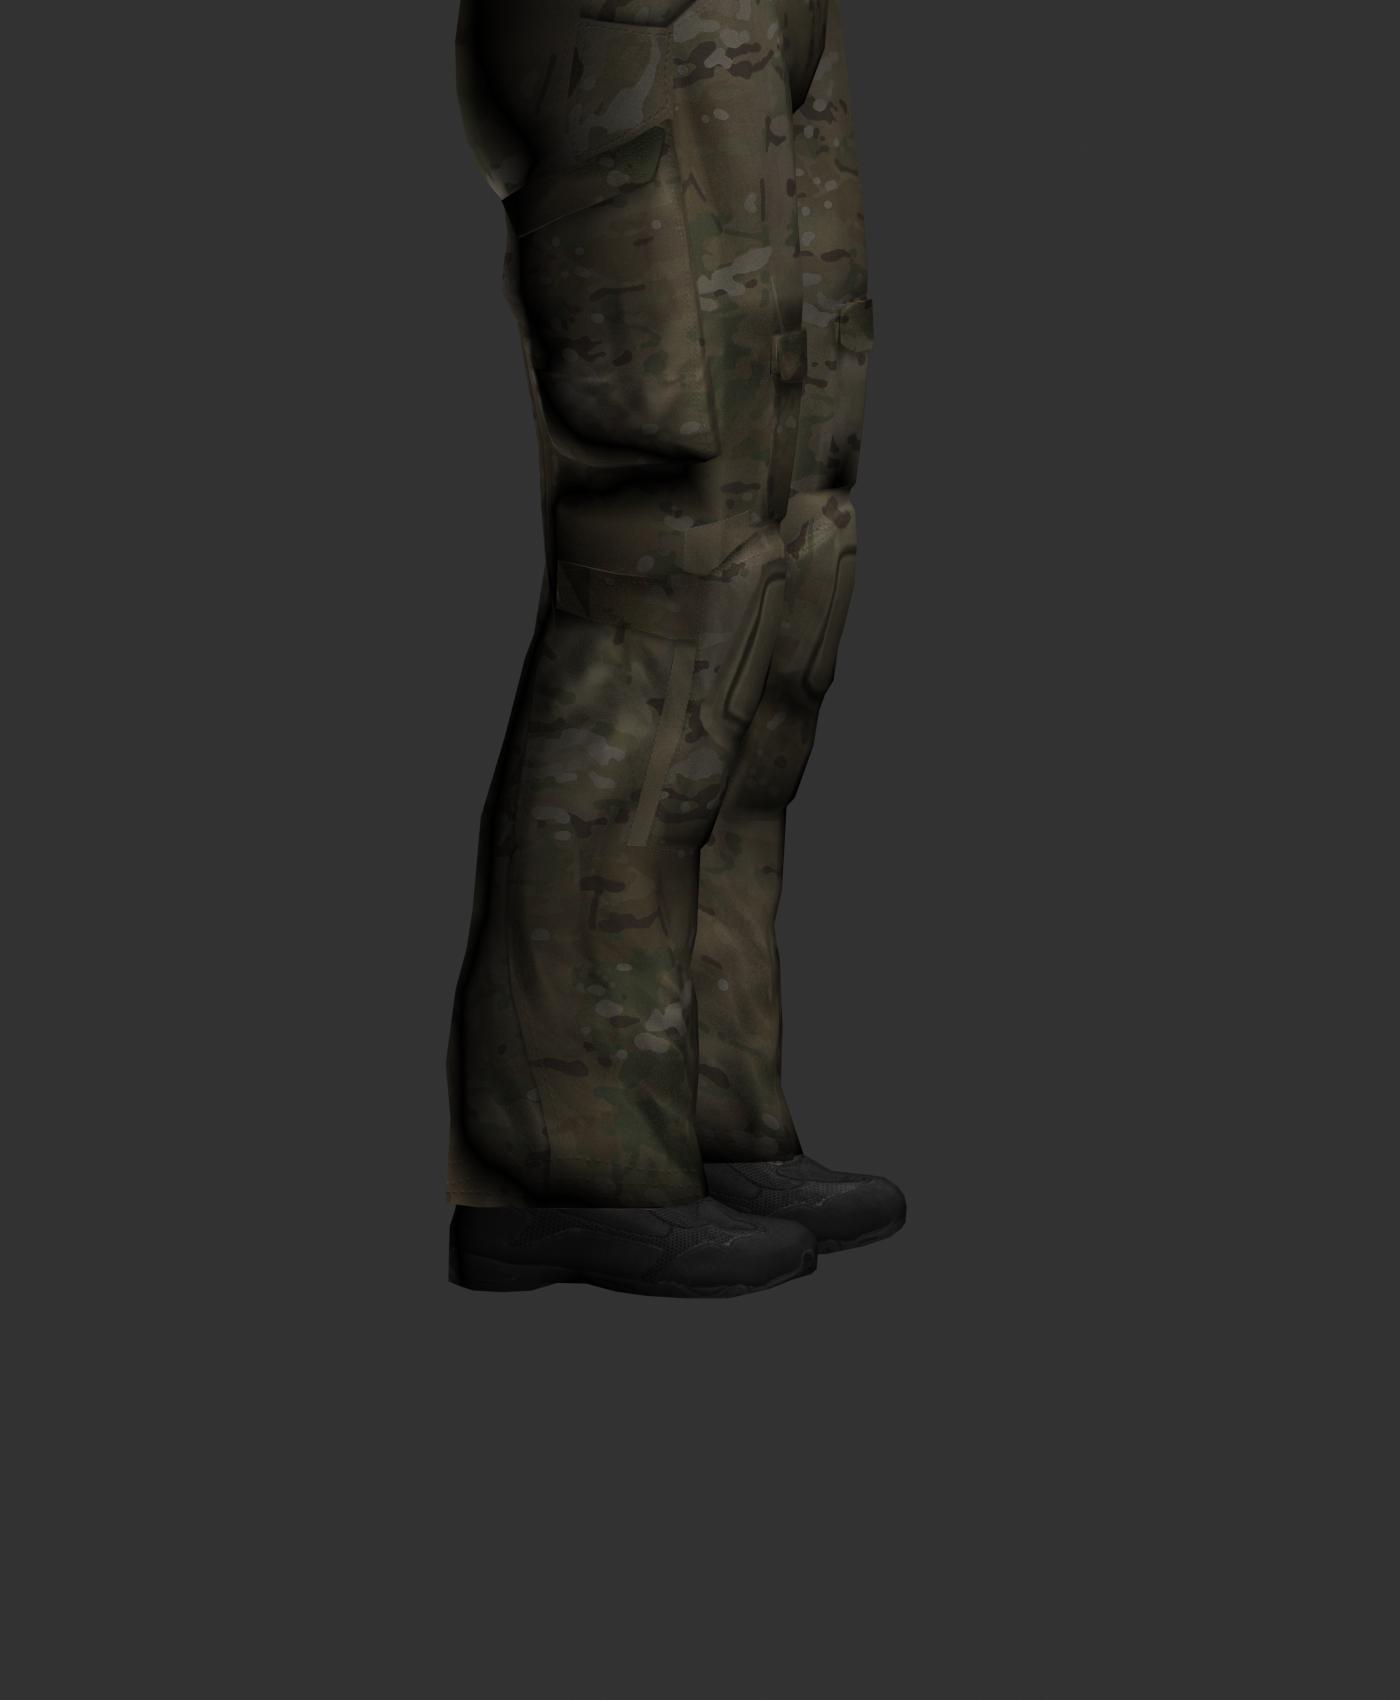 femal3_pants_hq_texture_side_by_zeealex-d843hb4.jpg